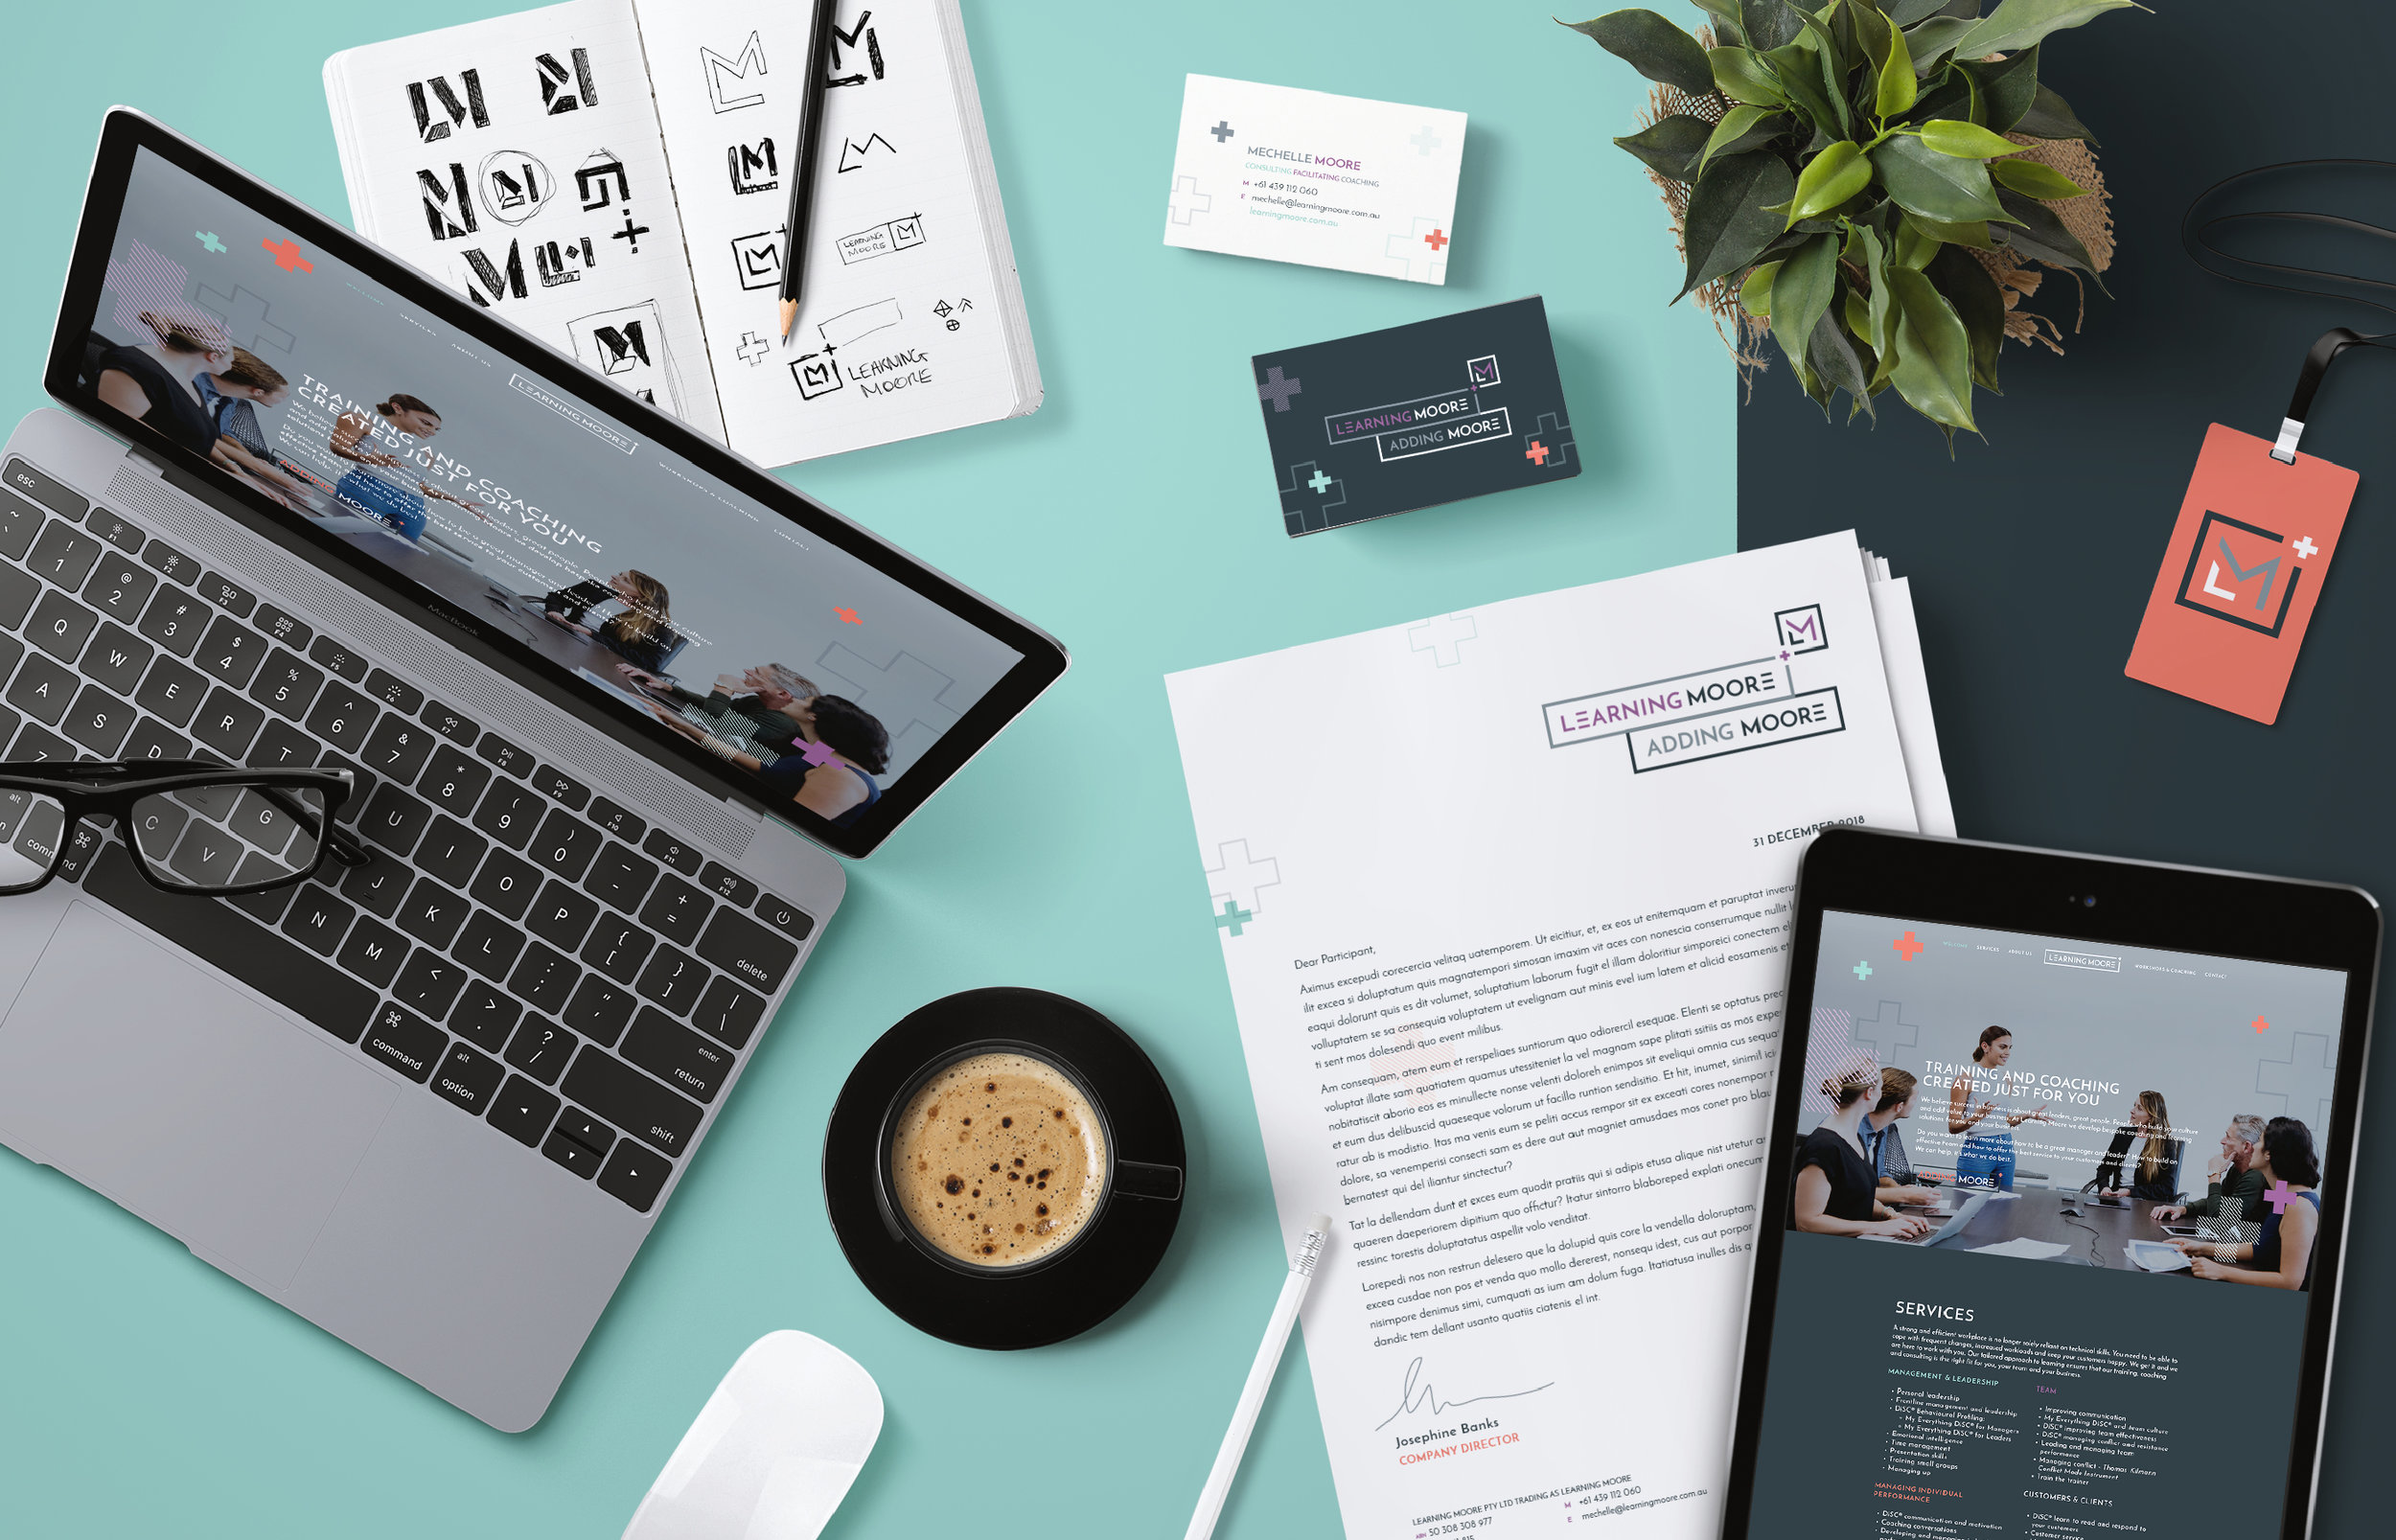 Website design for Learning Moore